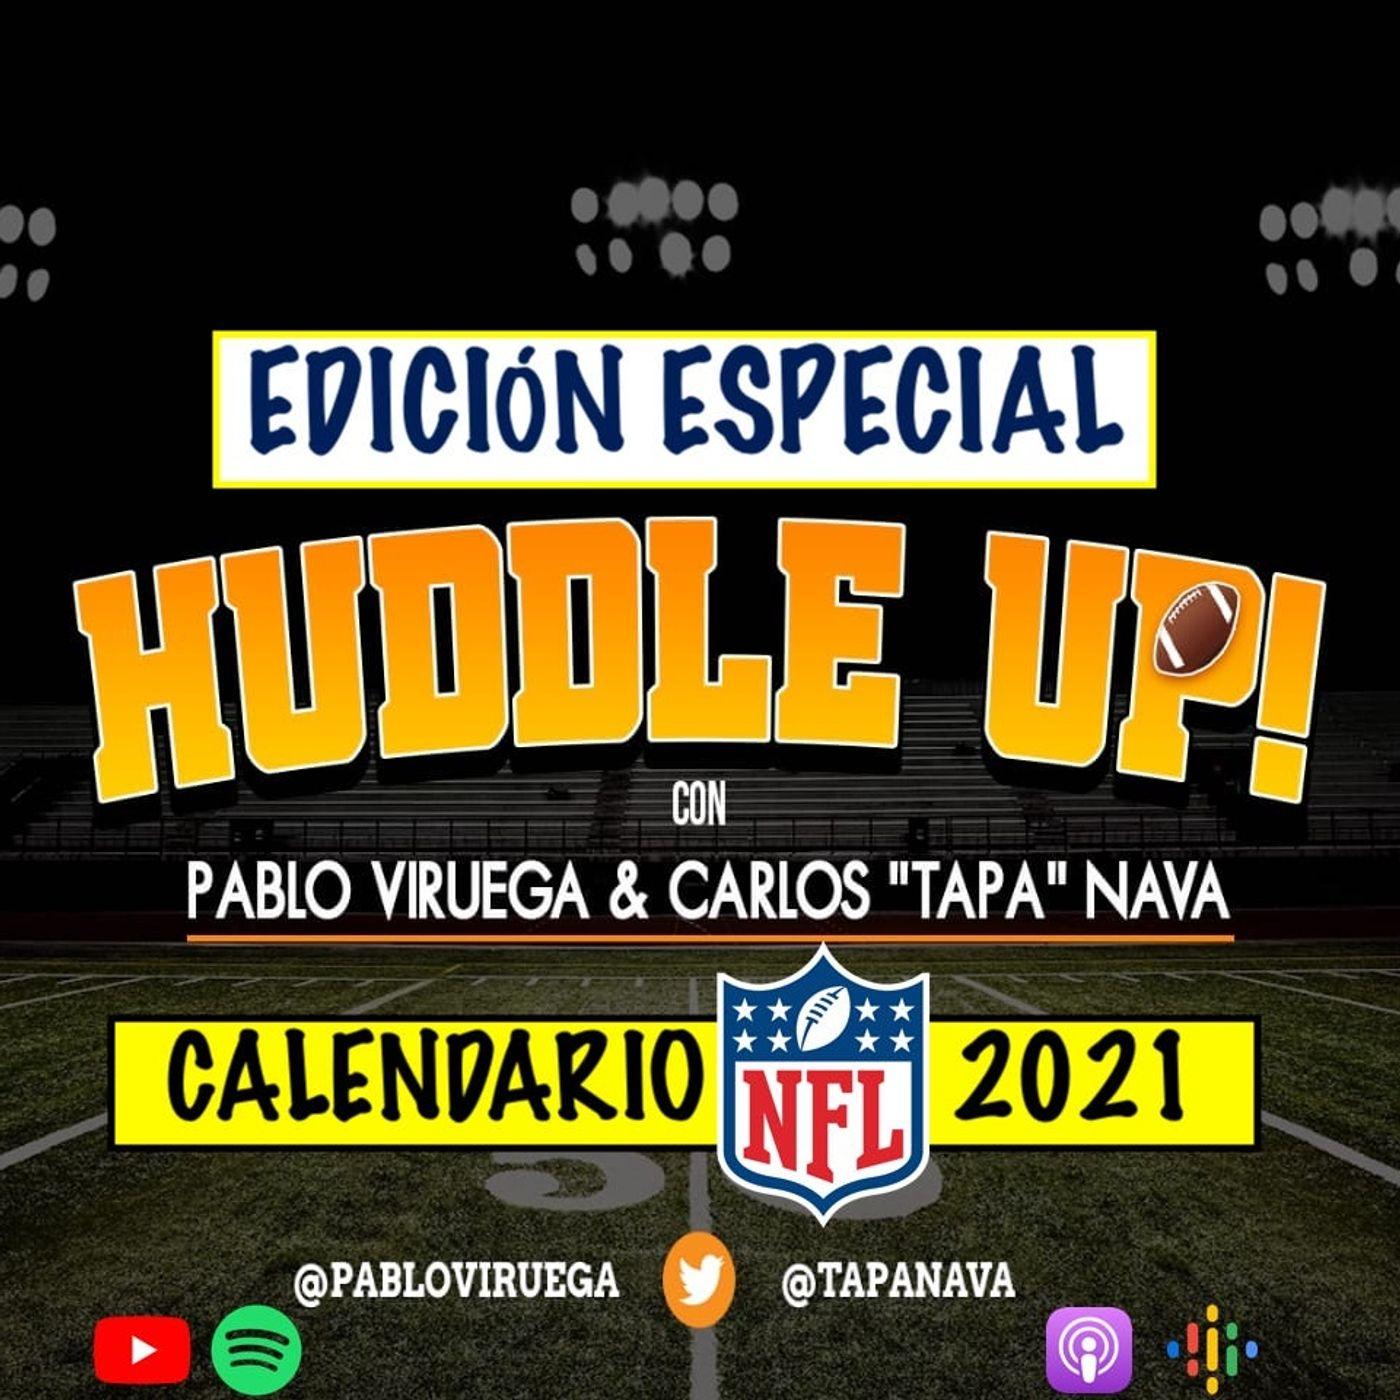 Calendario #NFL Temporada 2021 con @TapaNava y @PabloViruega en #HuddleUP